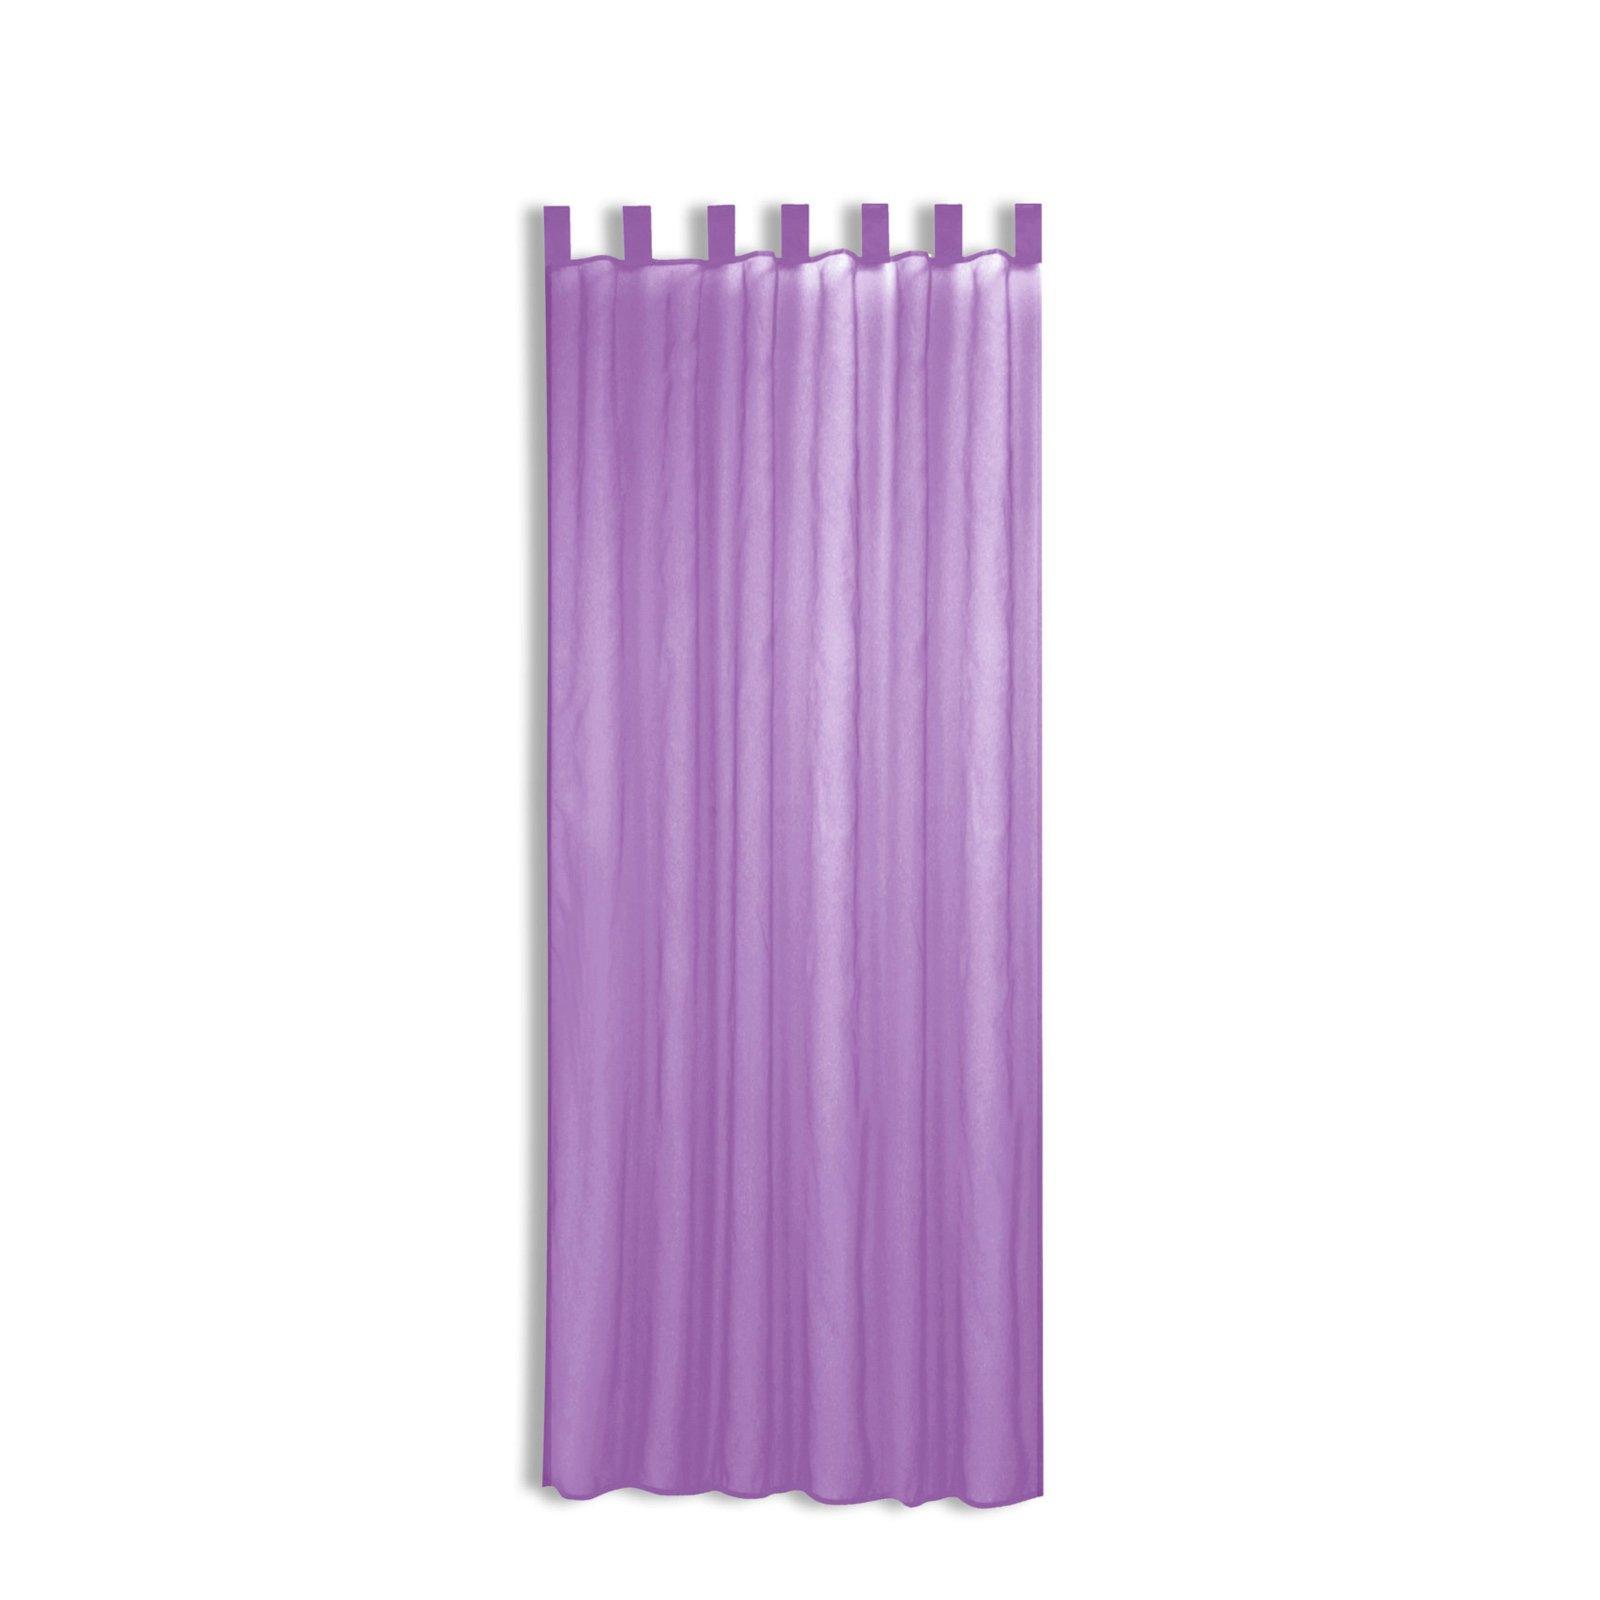 schlaufenschal look violett 140x225 cm transparente gardinen gardinen vorh nge deko. Black Bedroom Furniture Sets. Home Design Ideas